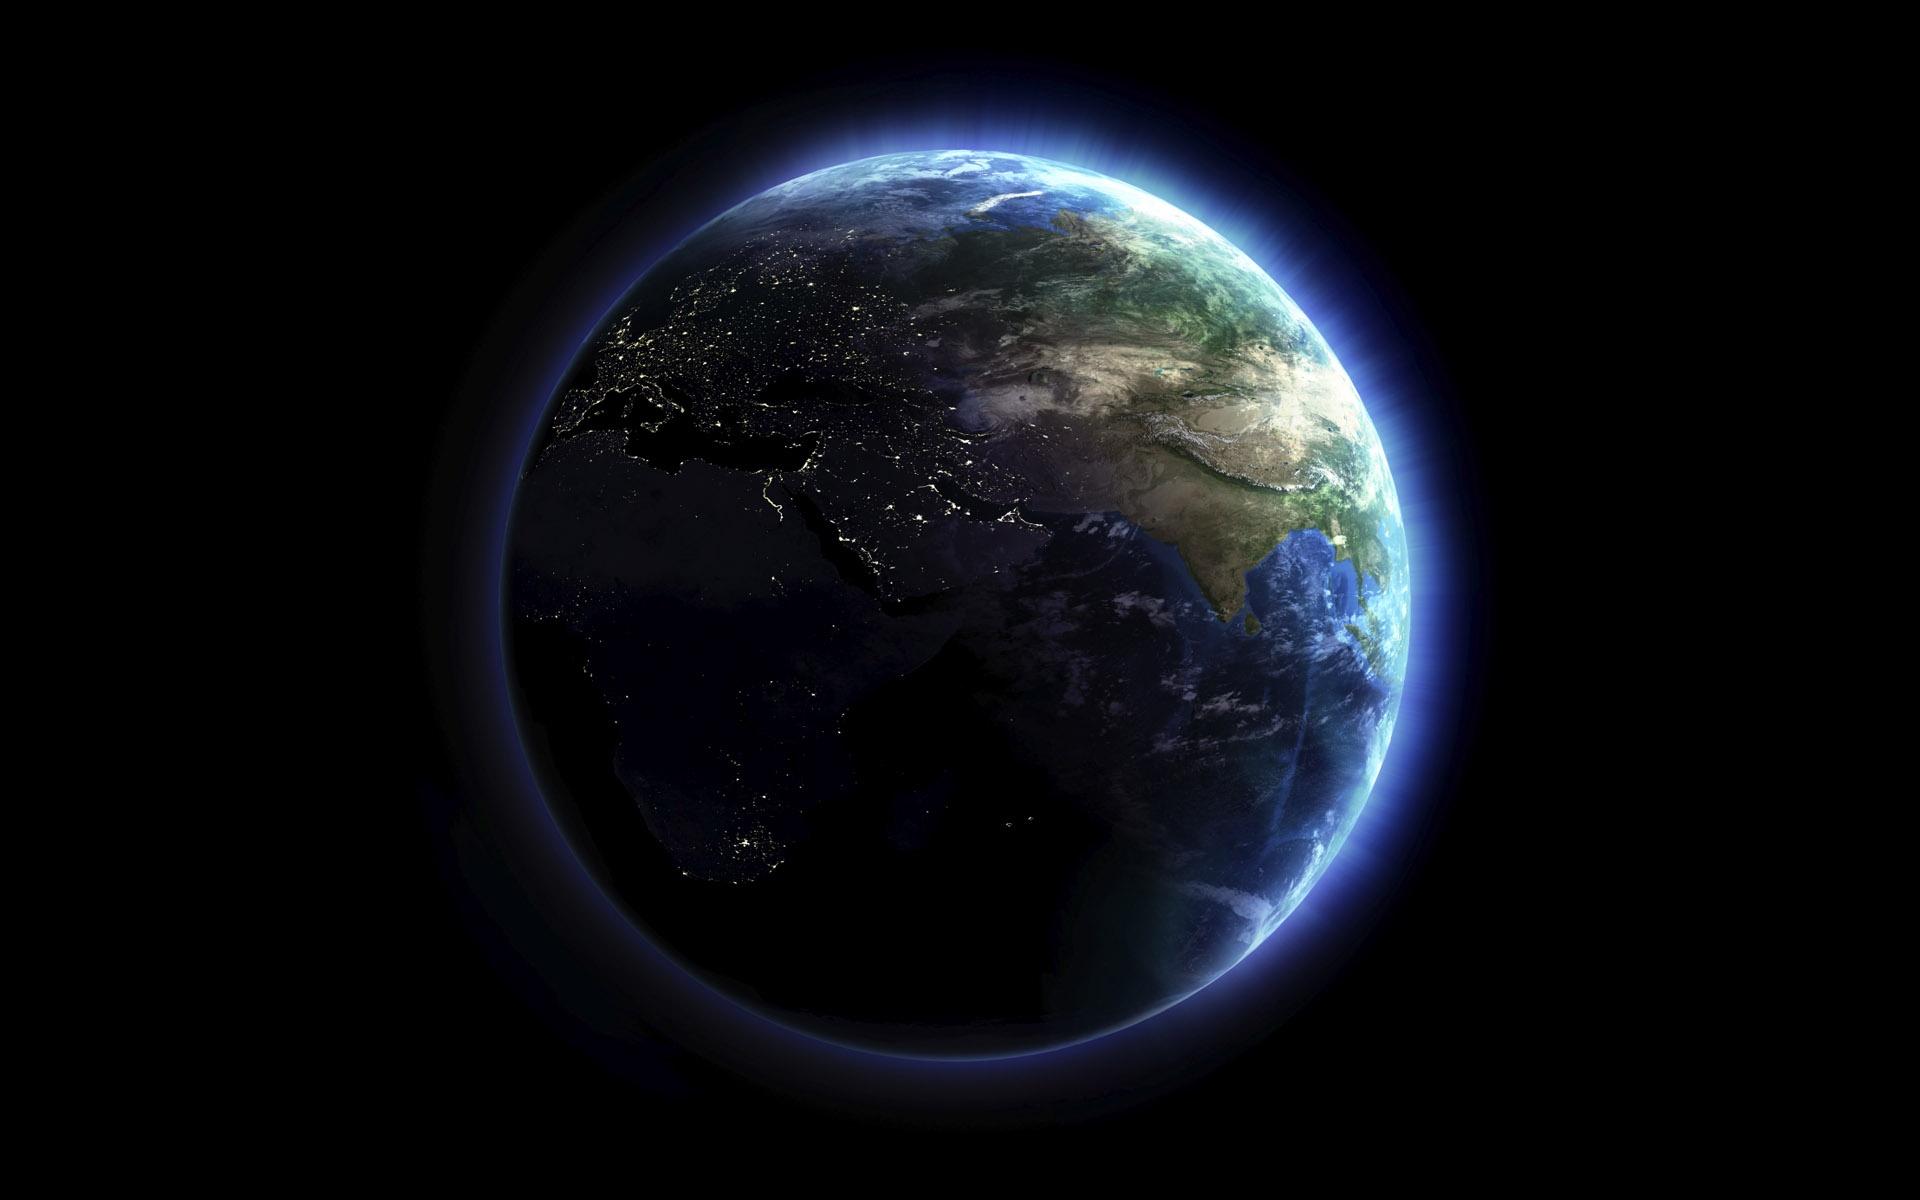 Earth From Space 36 Hd Wallpaper Wallpaper 1920x1200